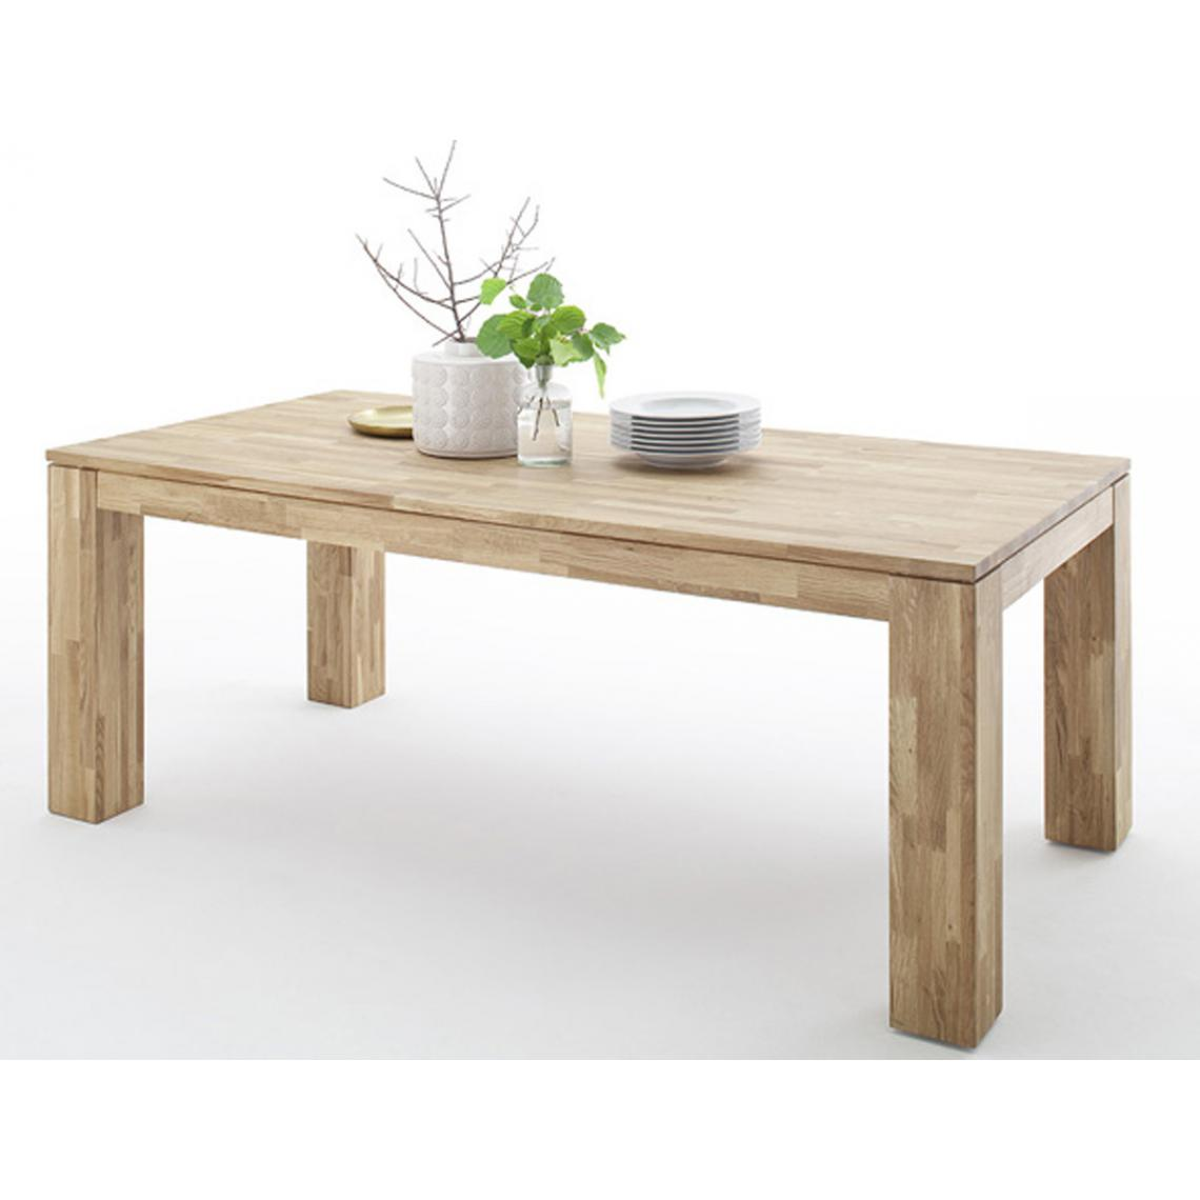 Pegane Table de salle à manger extensible en chêne sauvage - L.200-280 x H.77 x P.100 cm -PEGANE-